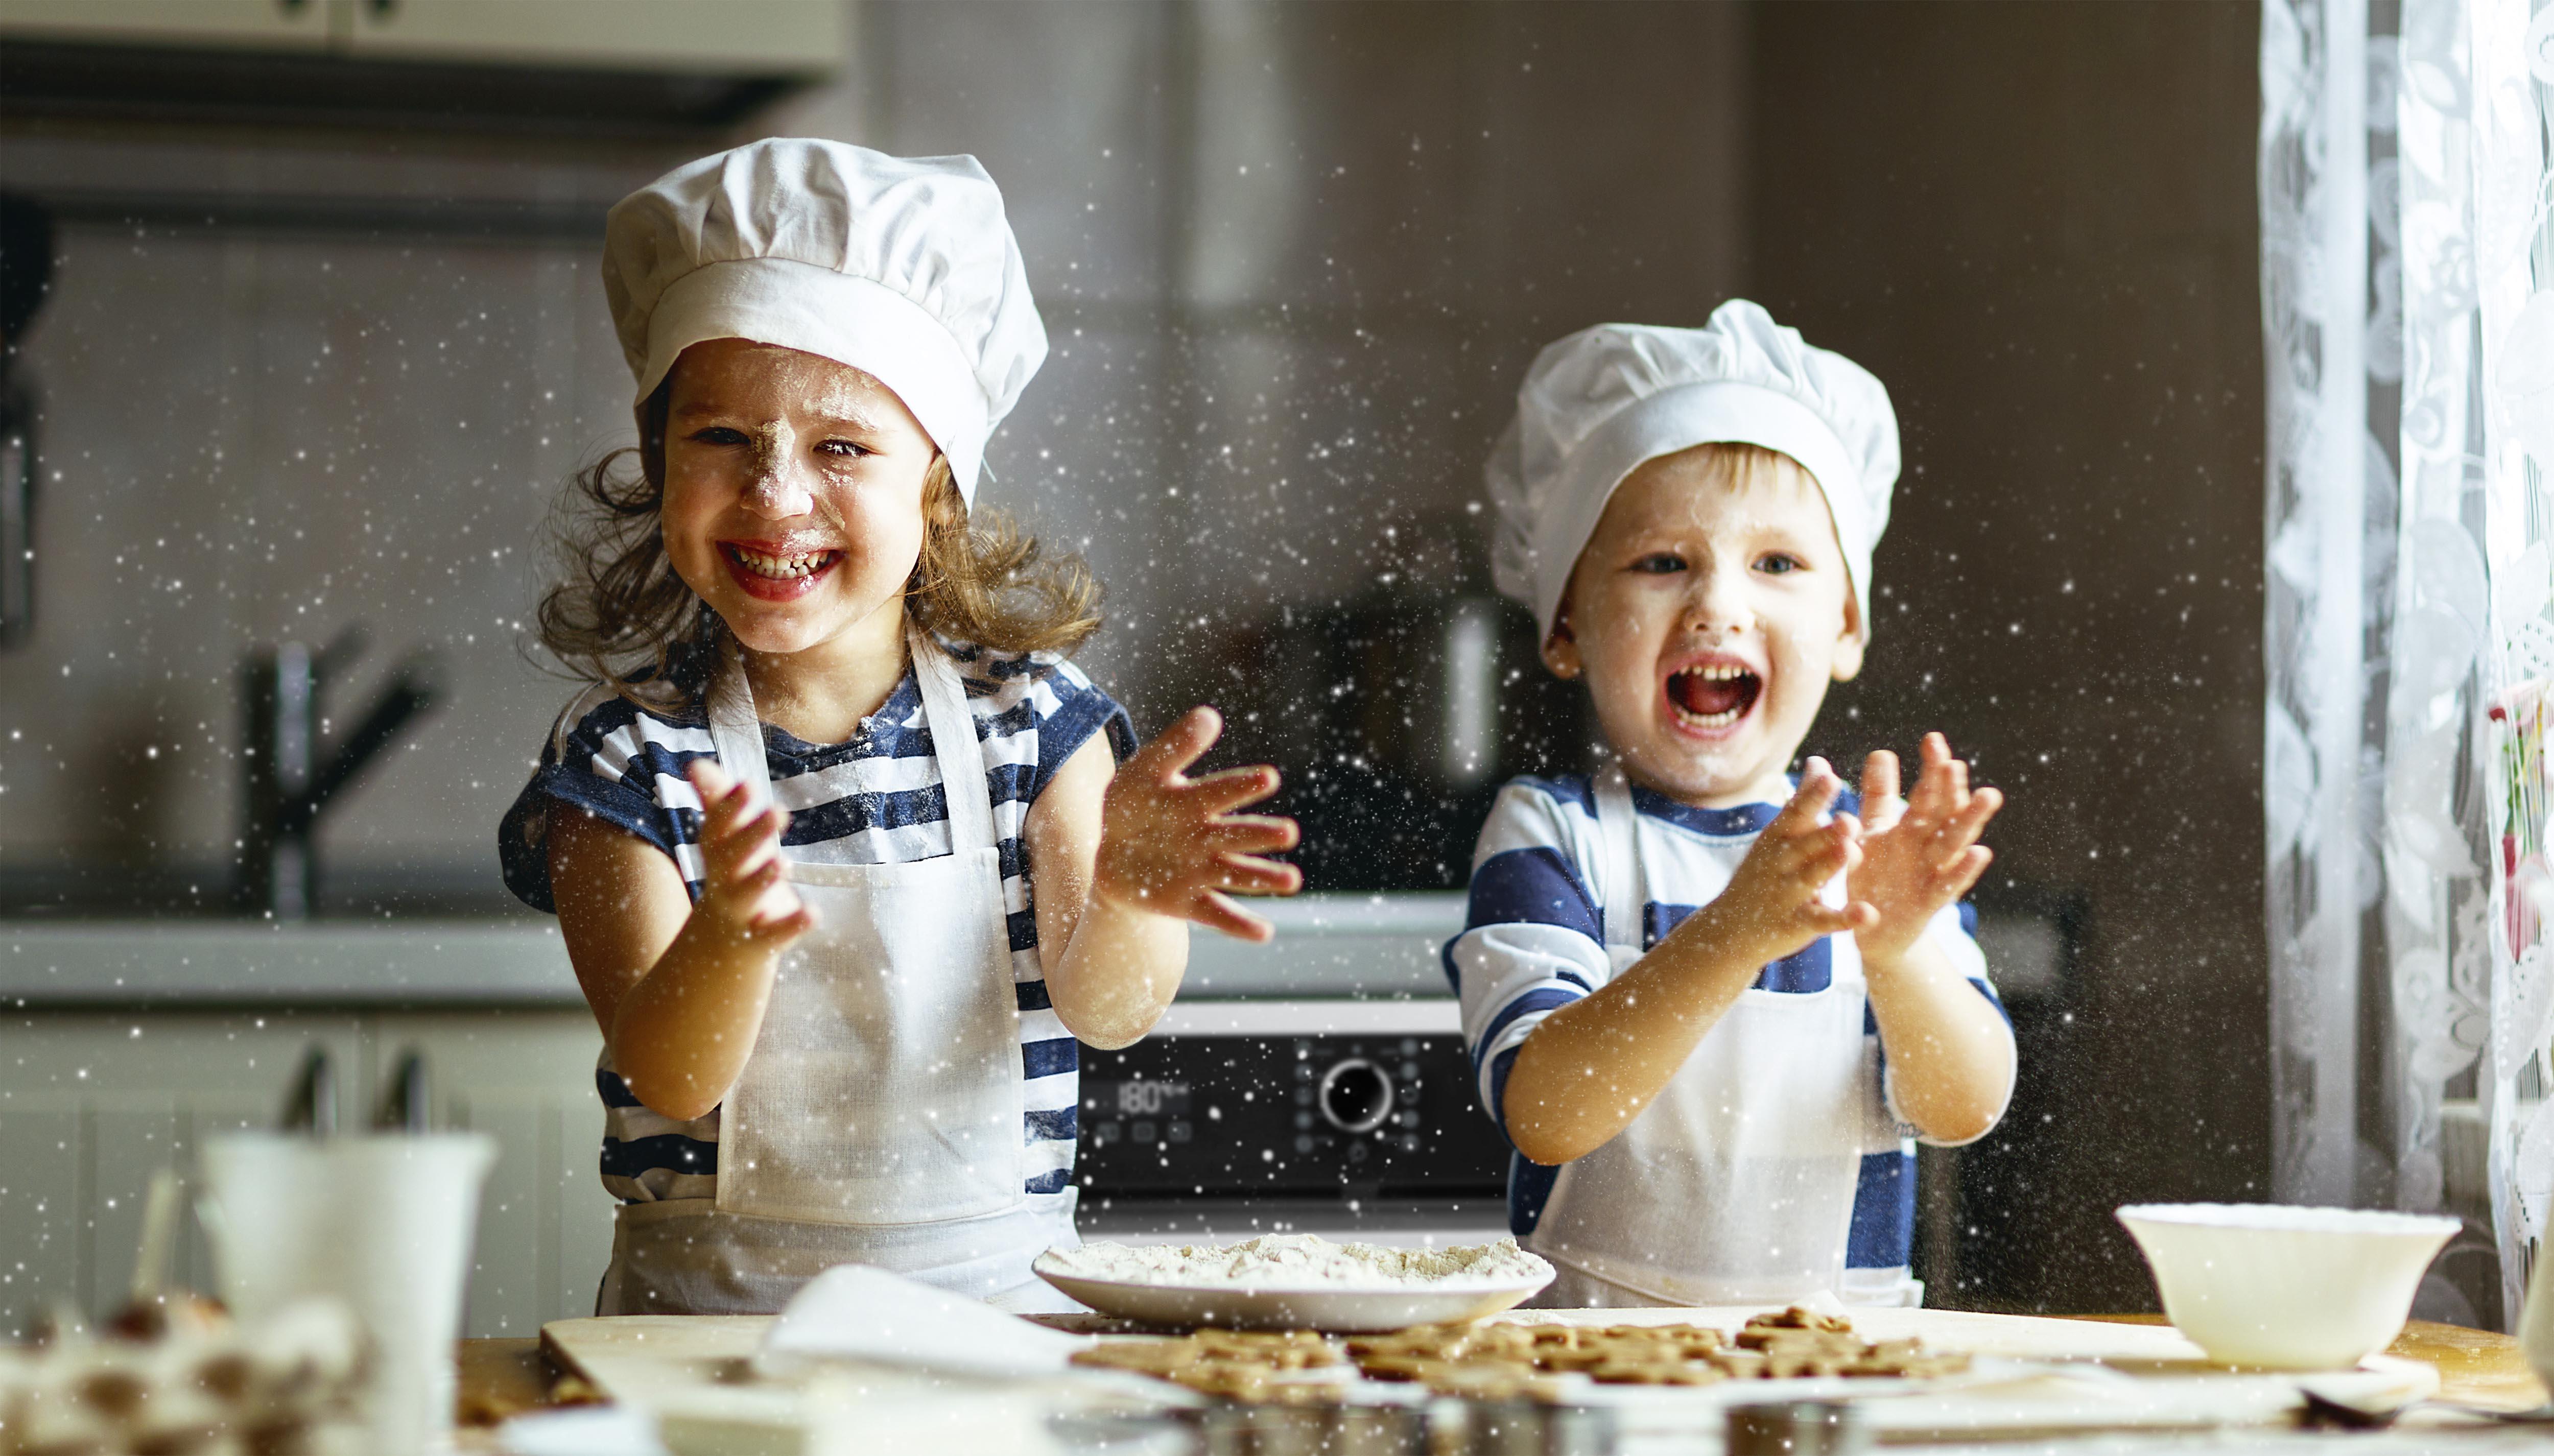 kids happy with family-н зурган илэрц